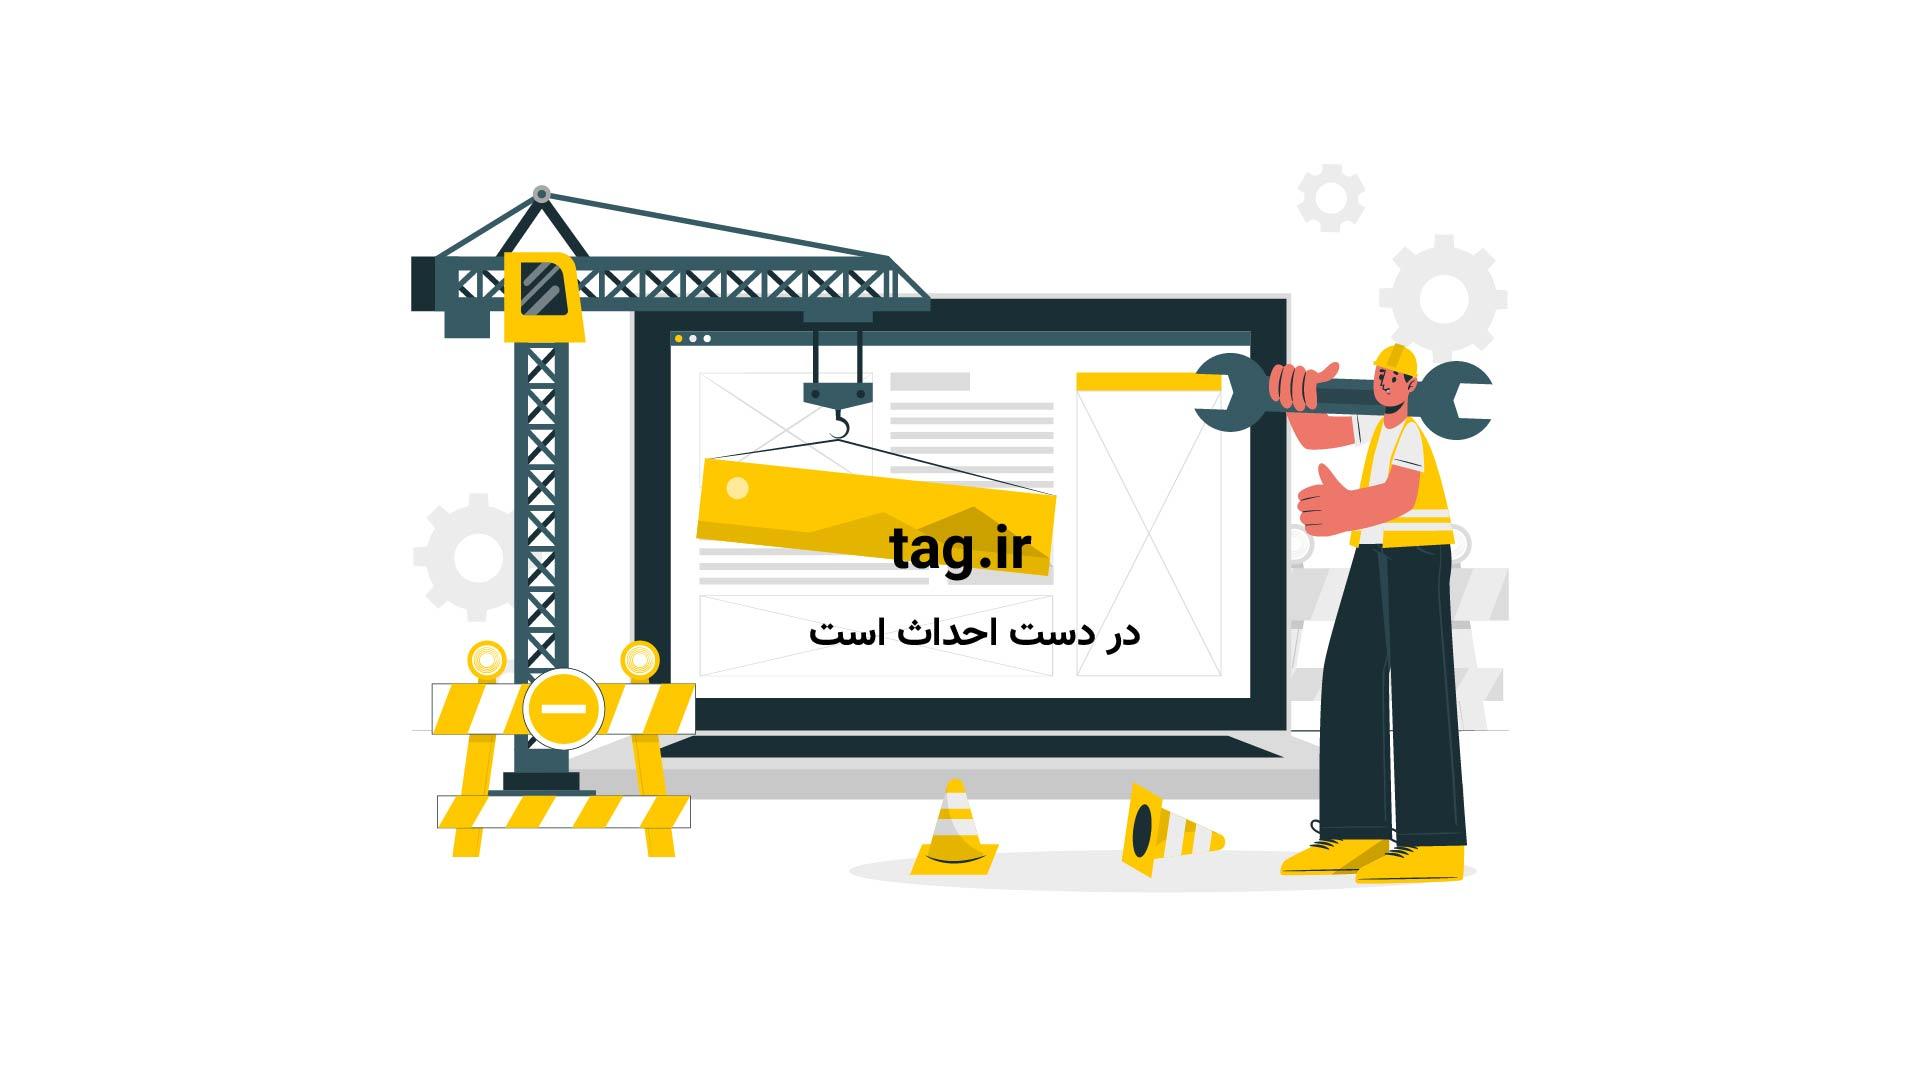 ناسا-ربات | تگ